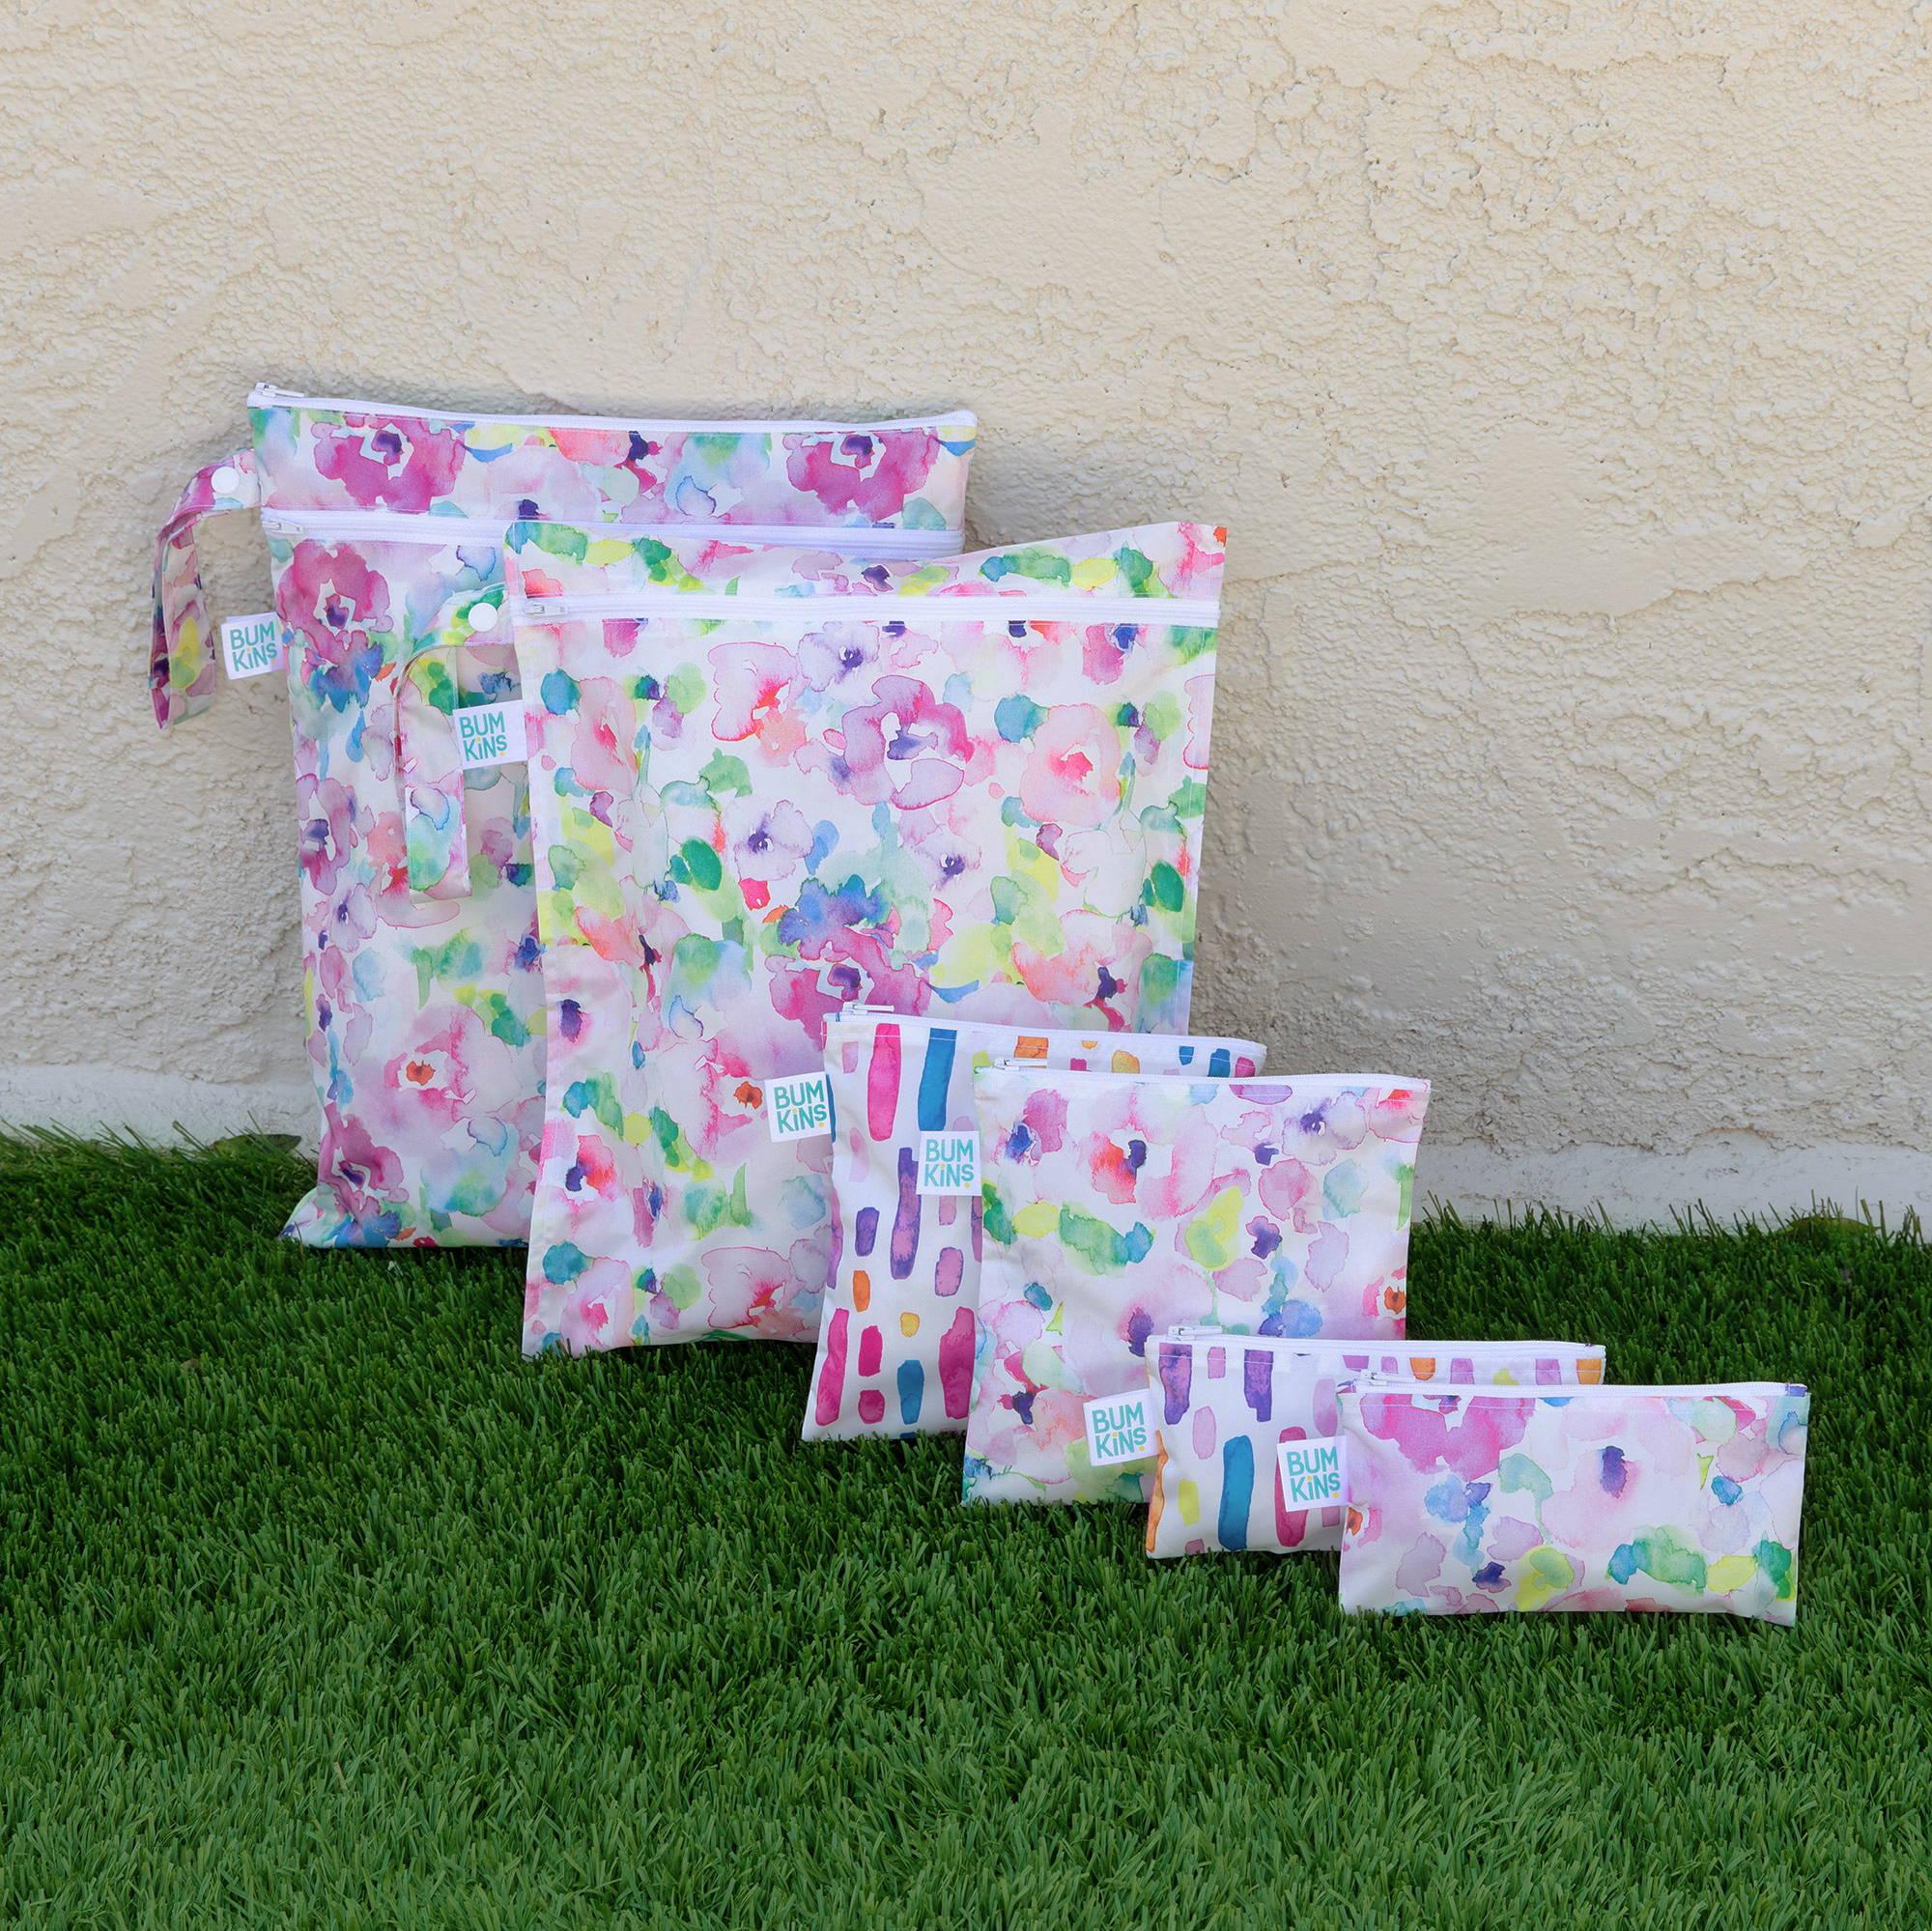 bumkins reusable snack bags, travel bags, wet bags, cloth diaper storage bags